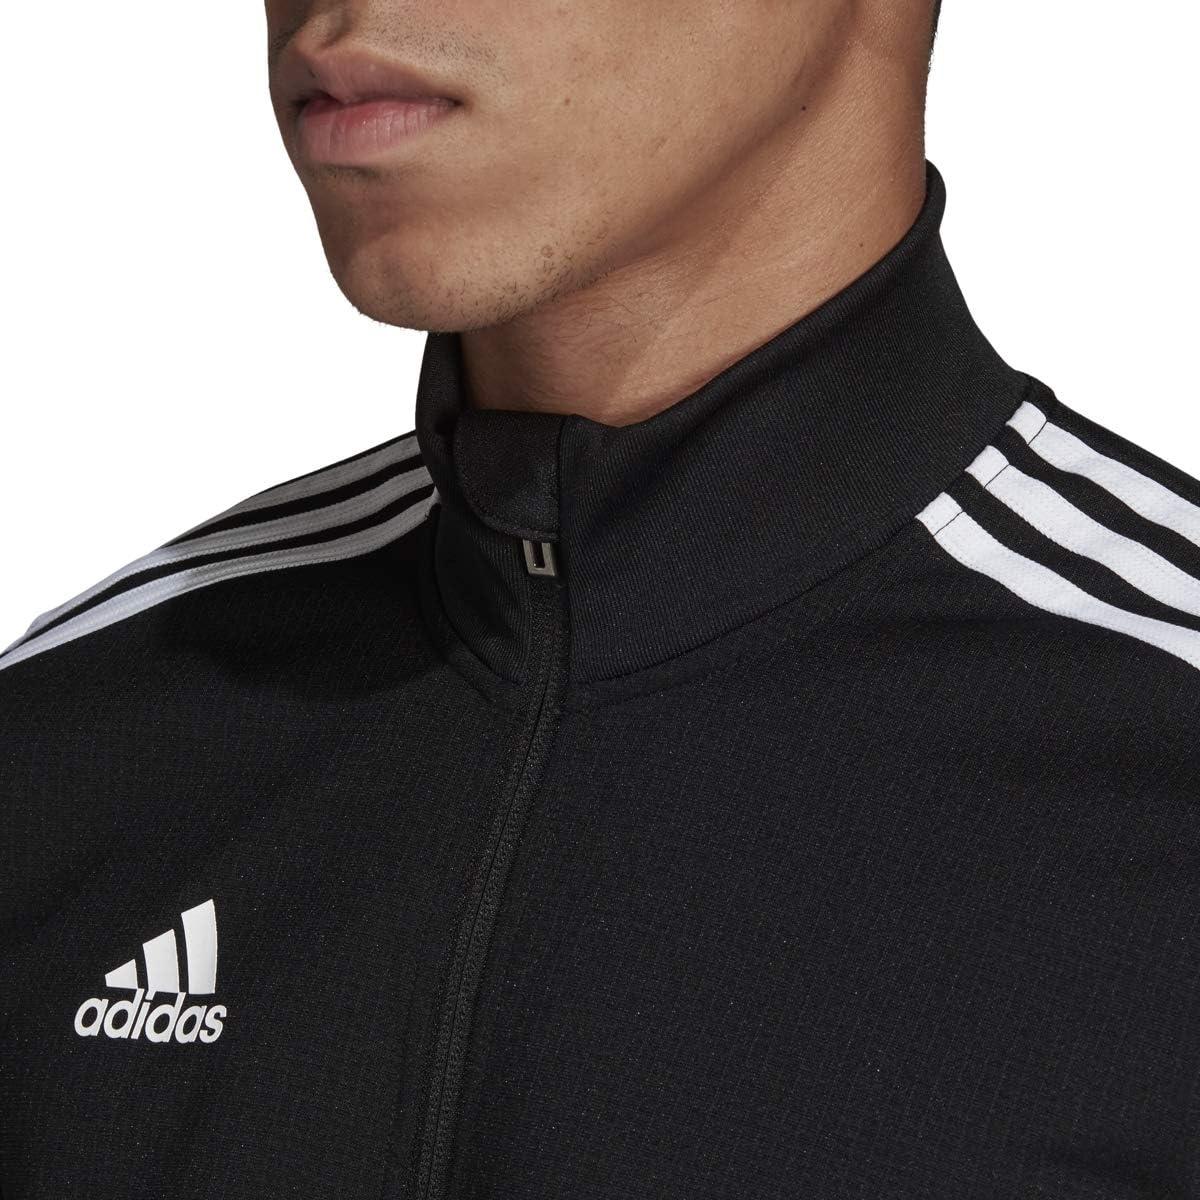 adidas Tiro 19 Training Jacket Mens